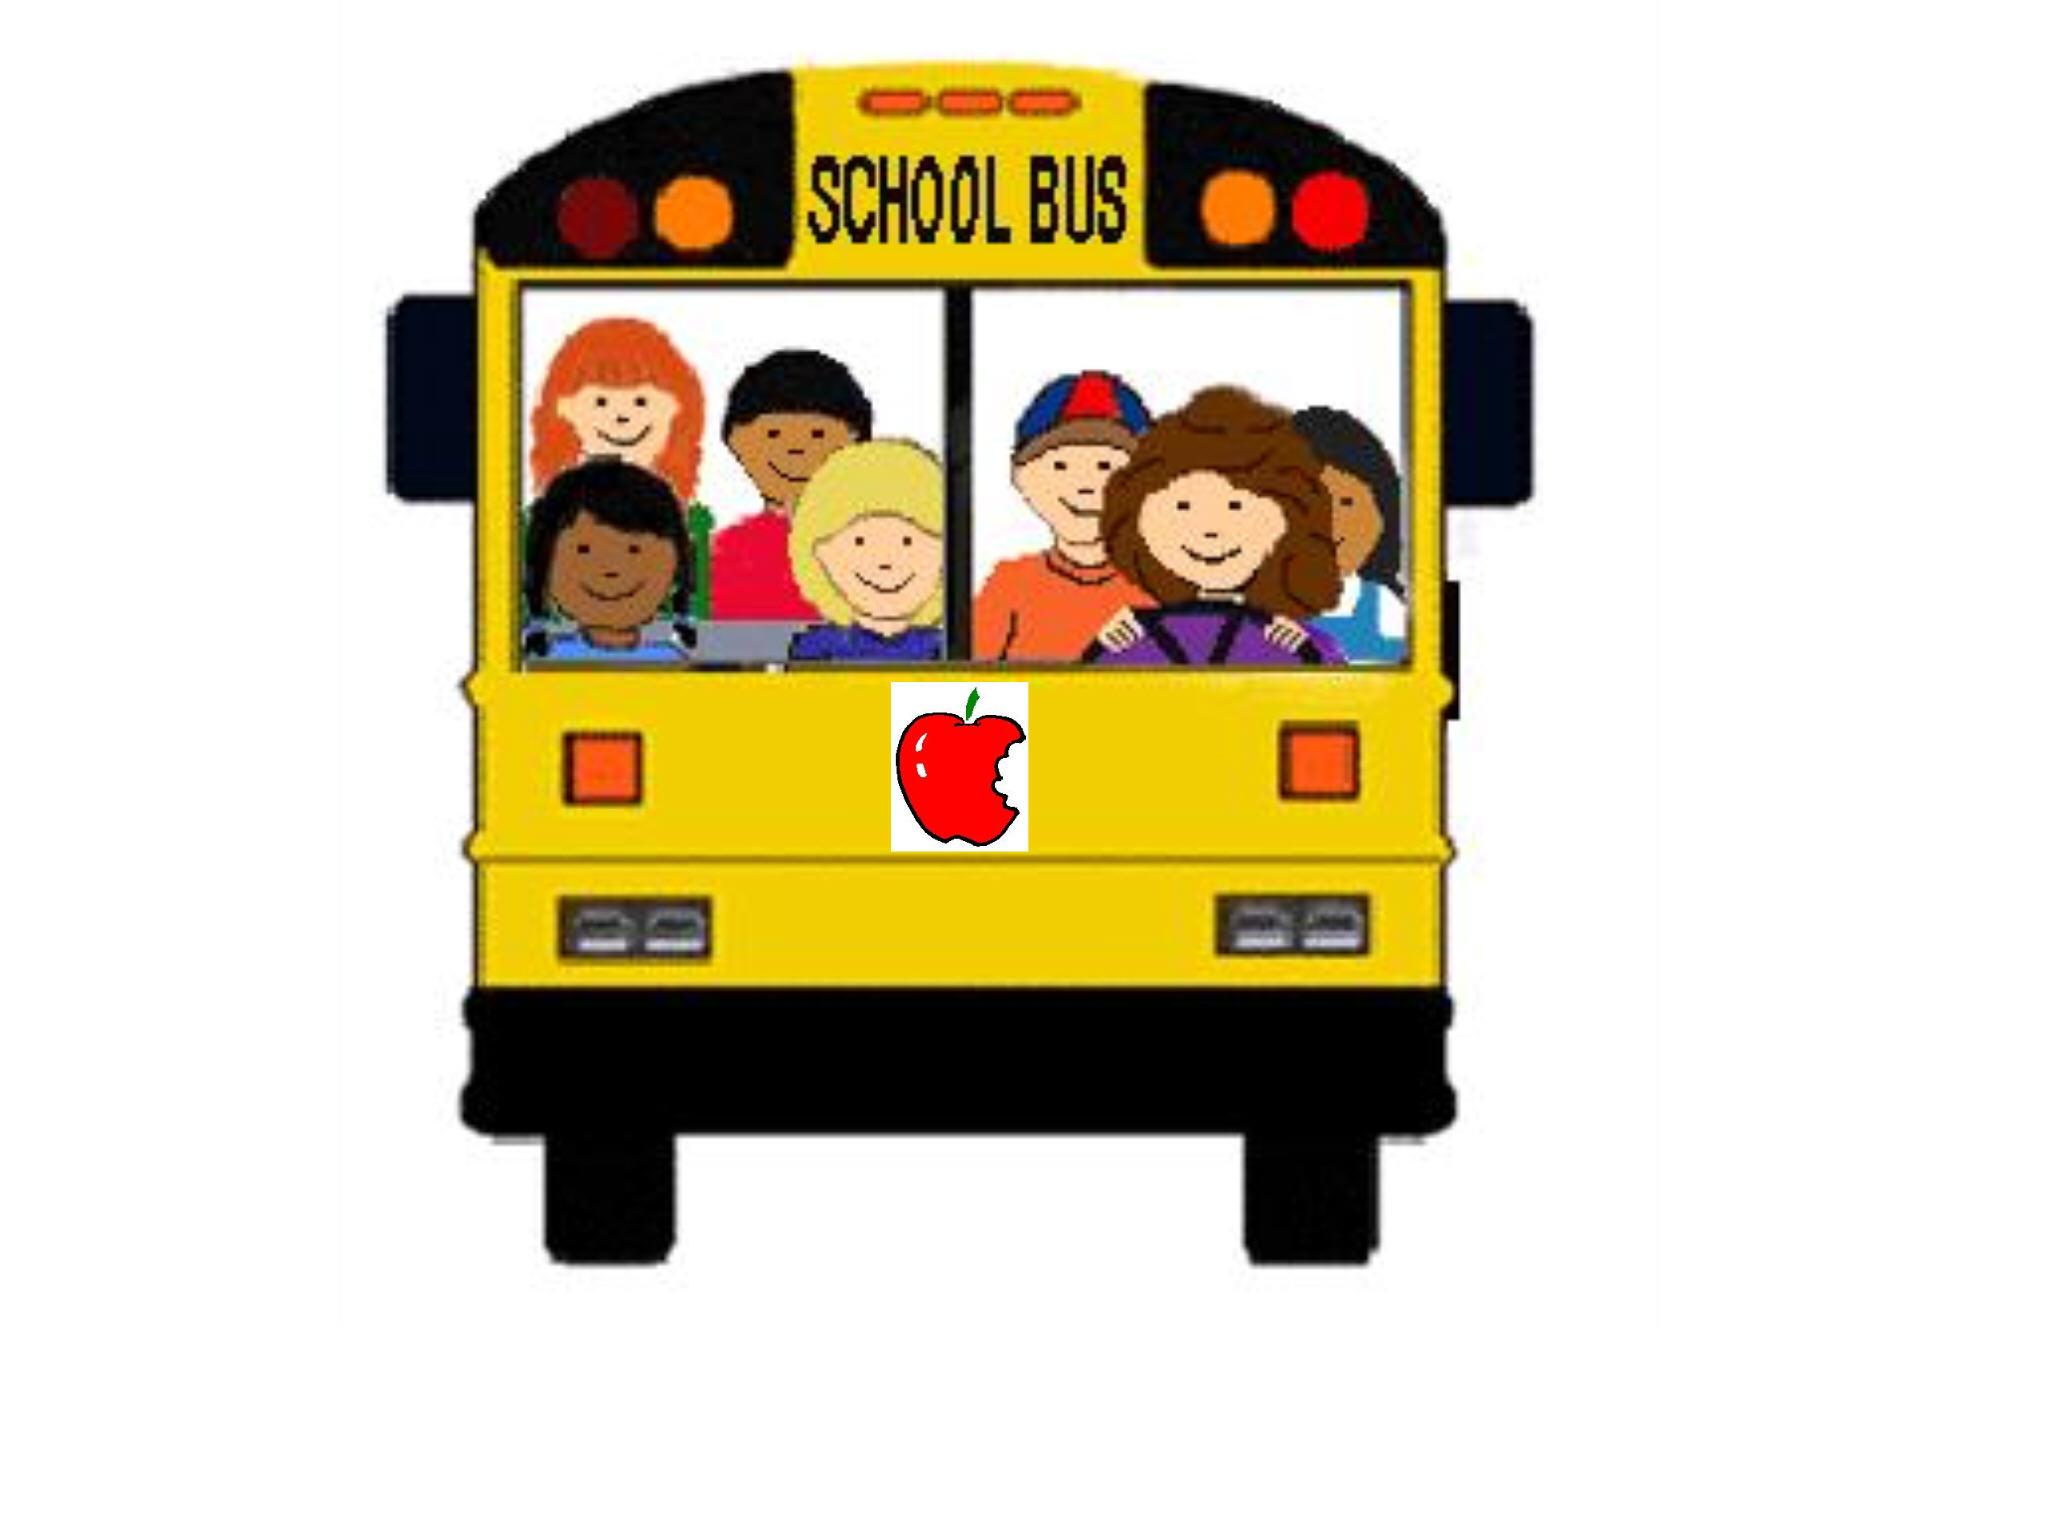 2048x1536 School Bus Clip Art Black And White Free Clipart 3 Clipartix